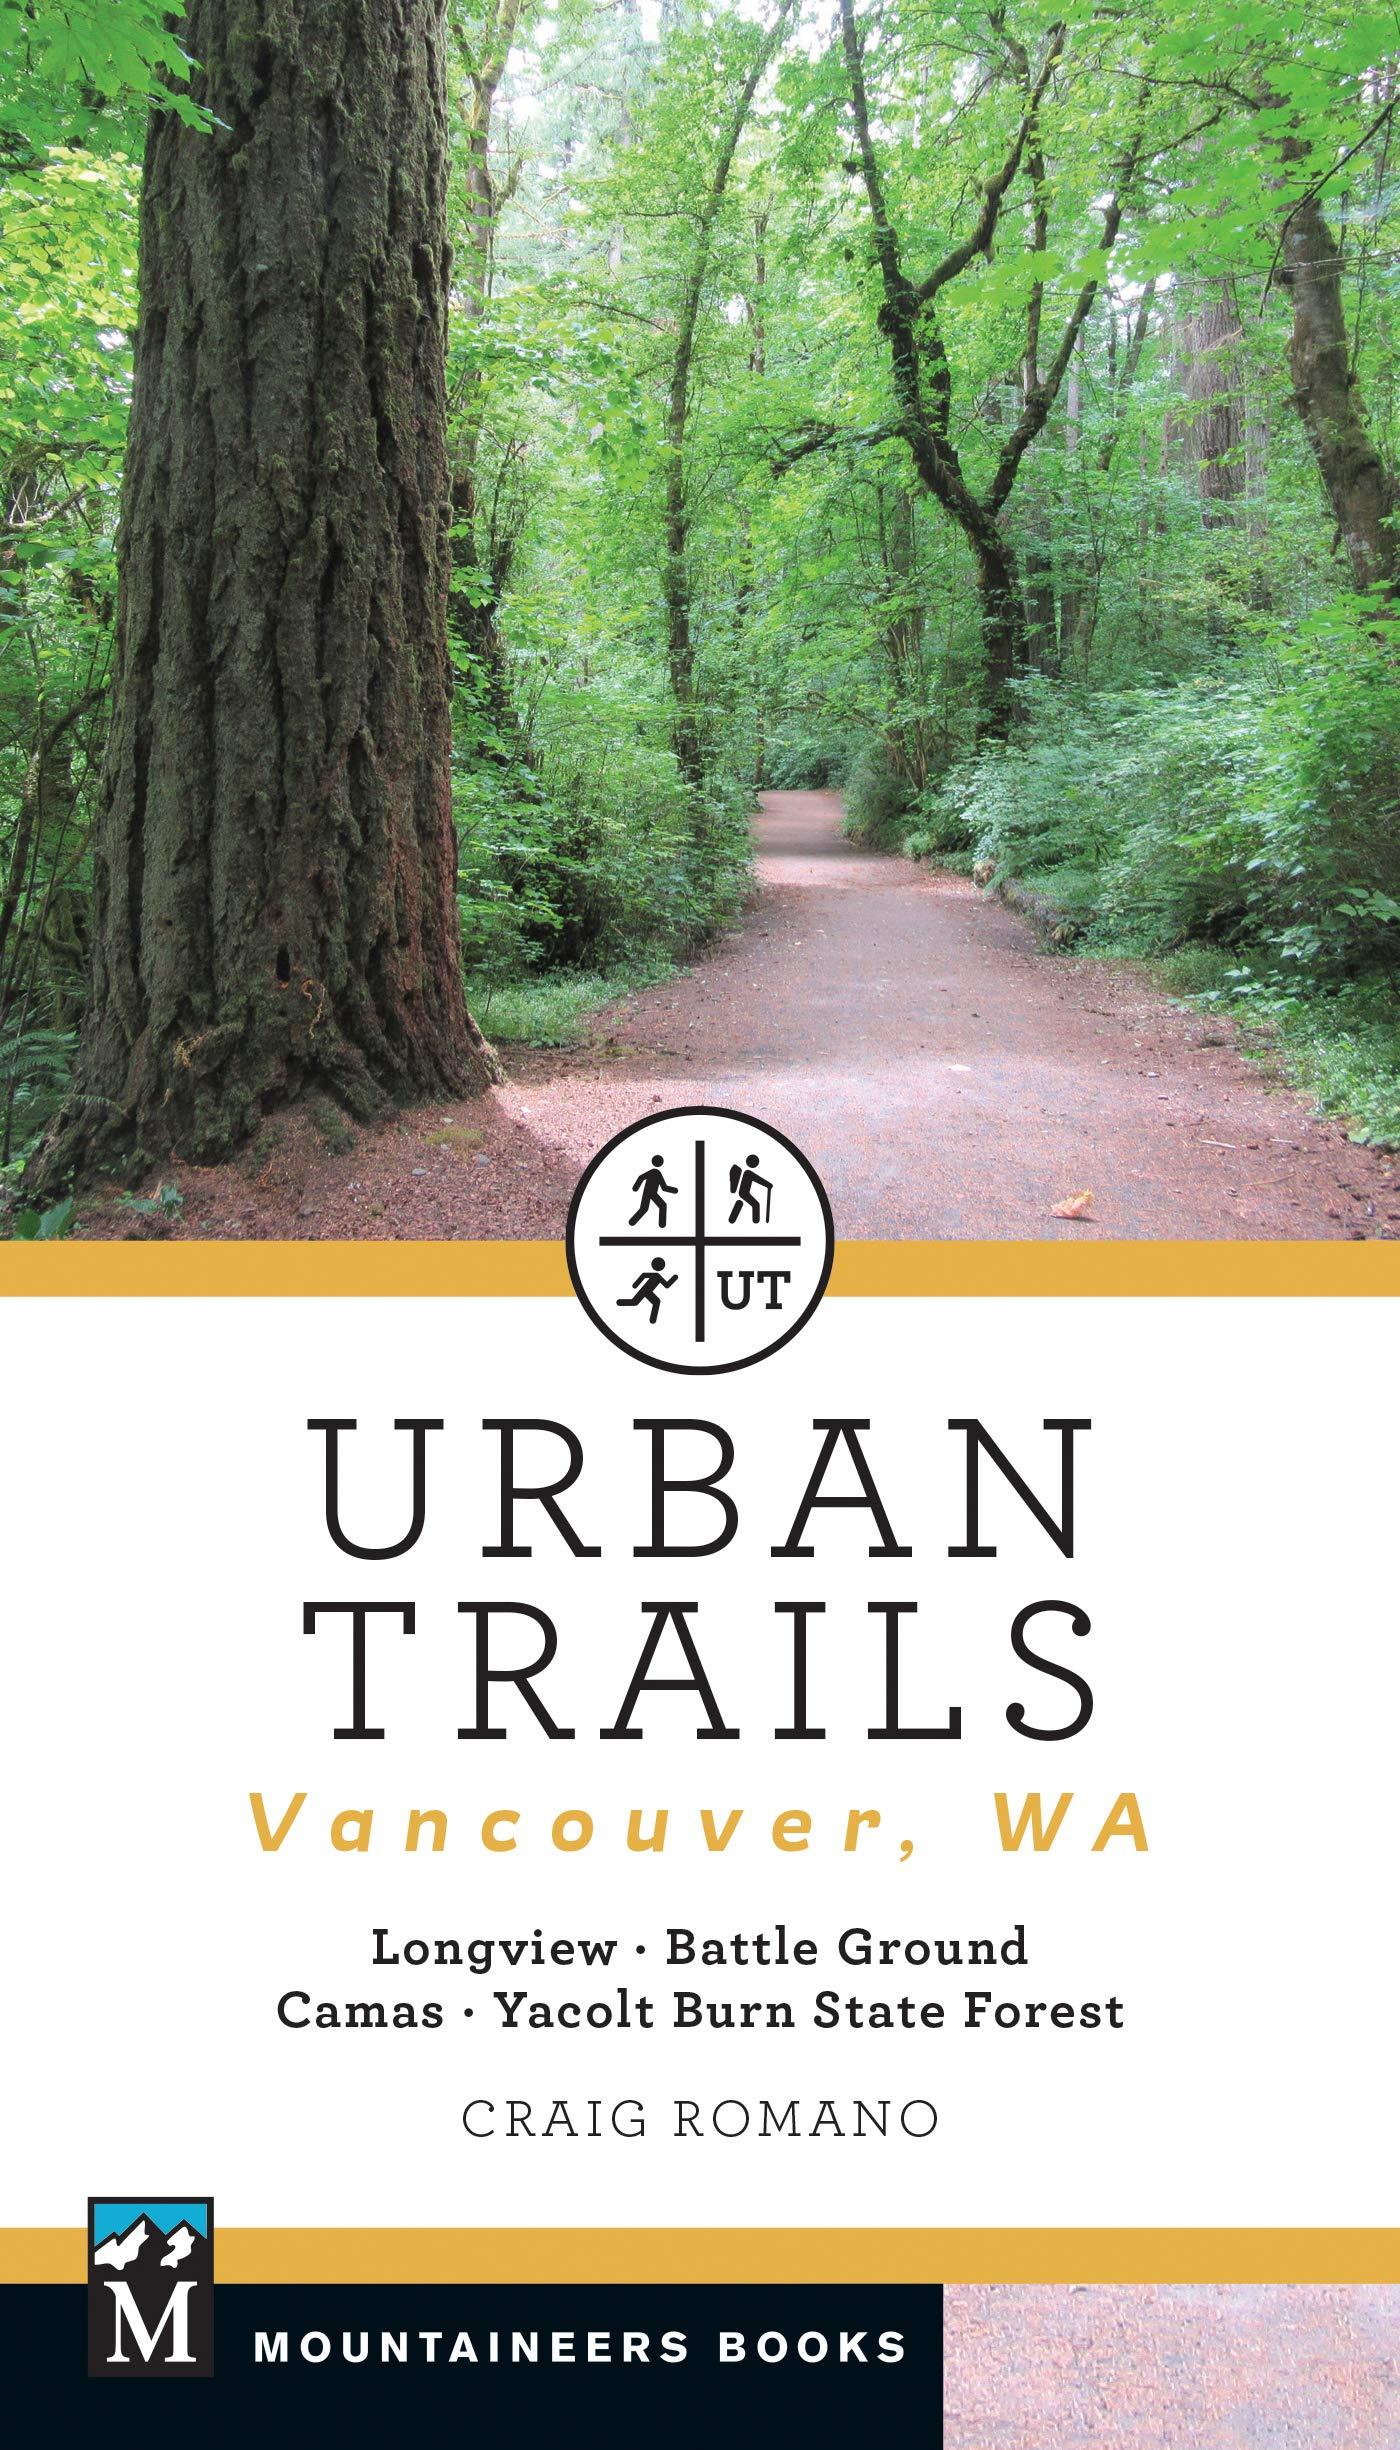 Image for Urban Trails: Vancouver, Washington: Longview, Battle Ground, Camas, Yacolt Burn State Forest